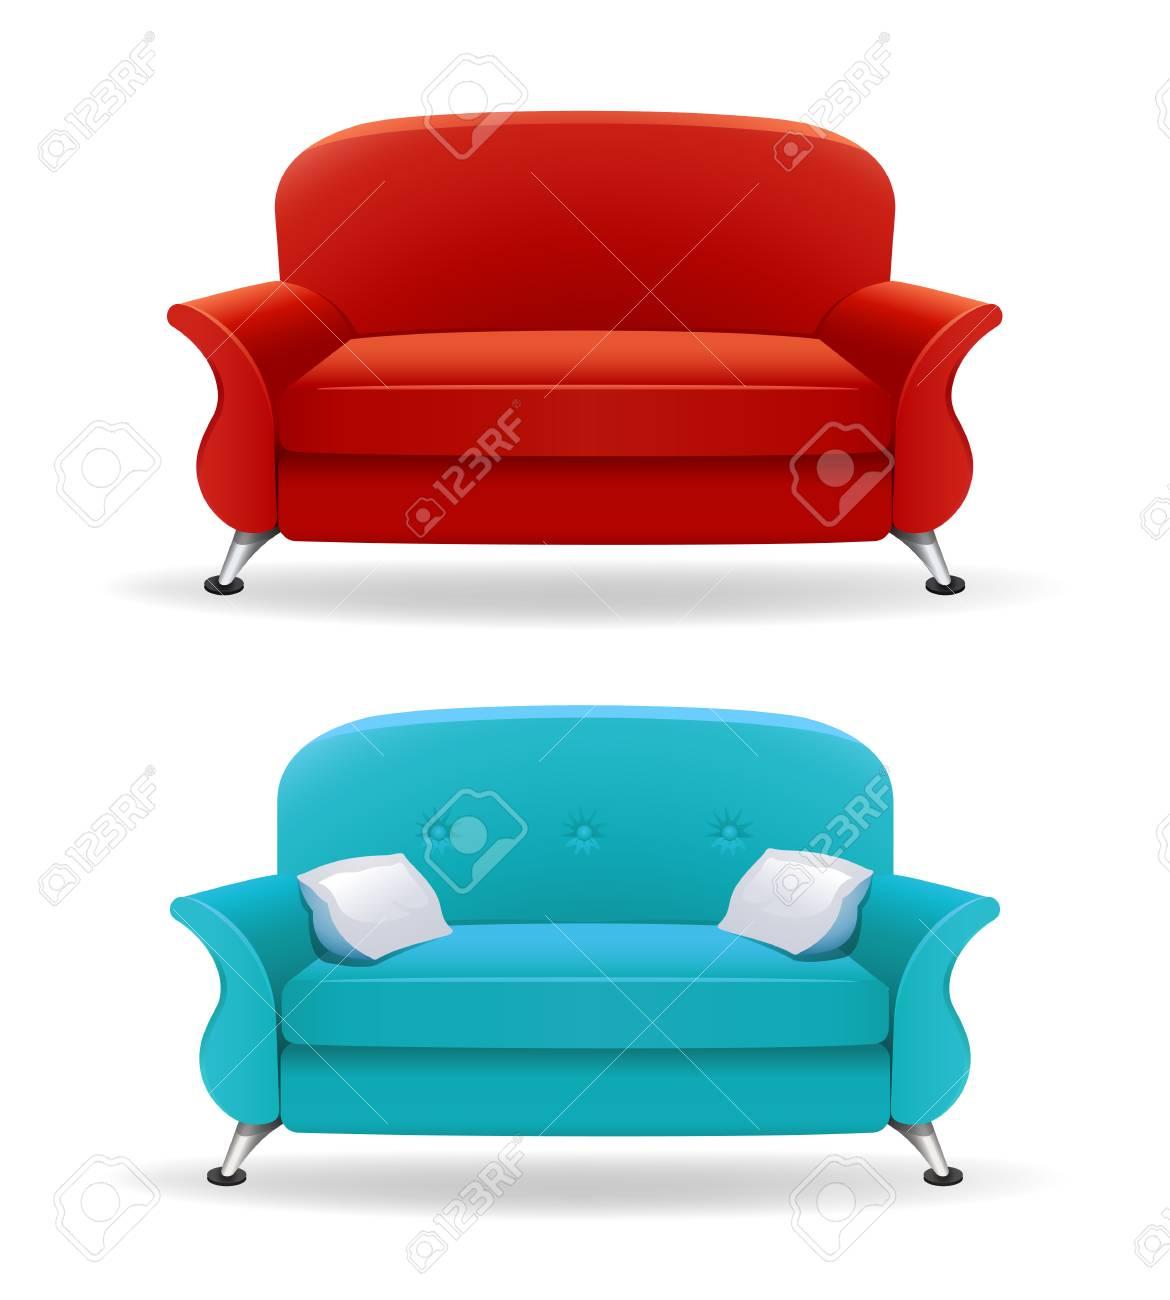 Interior design with realistic sofa - 61619005